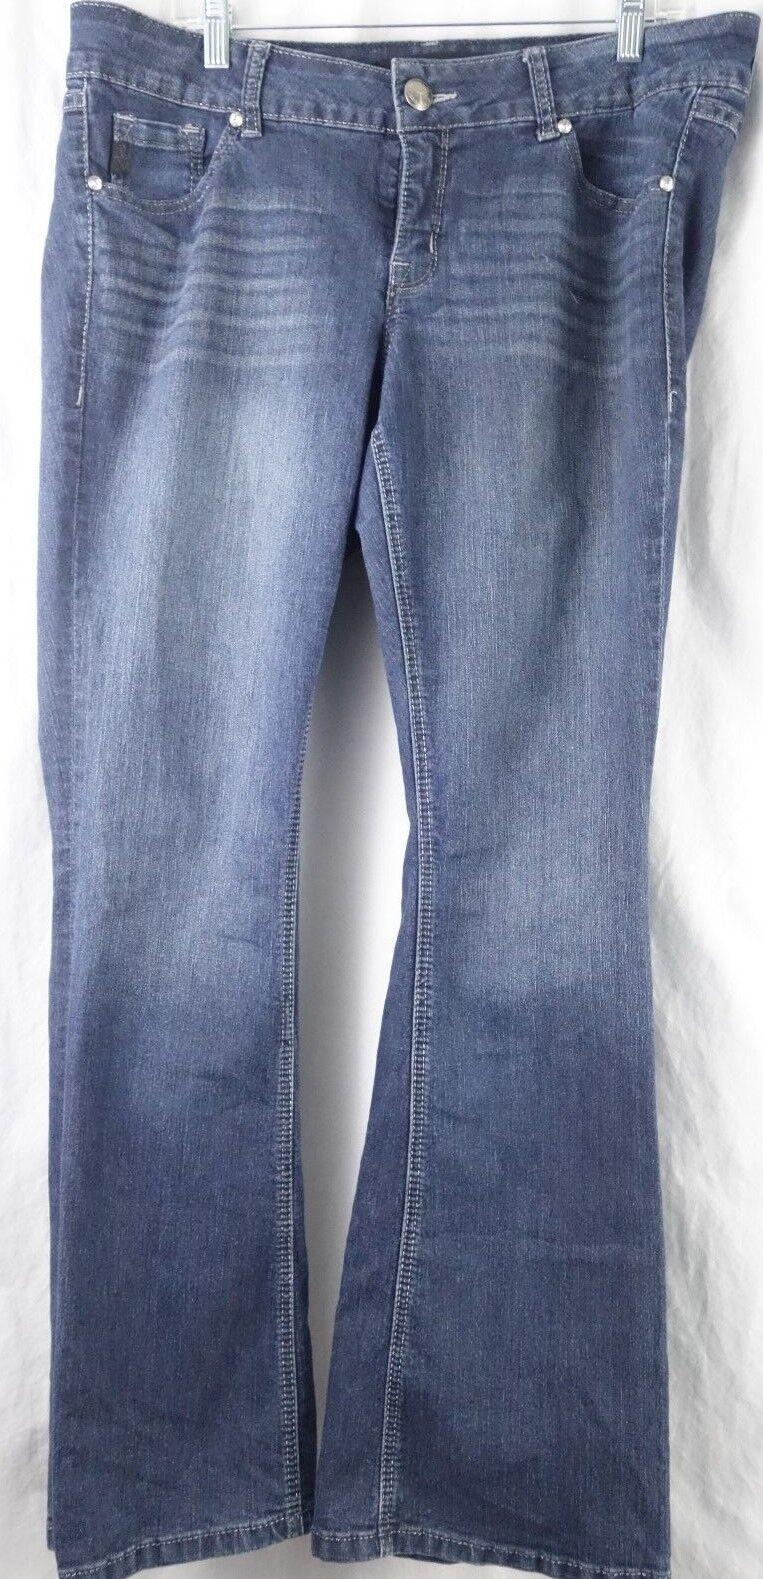 TORRID bluee Denim Jeans Pants Bootcut Women's Plus 16